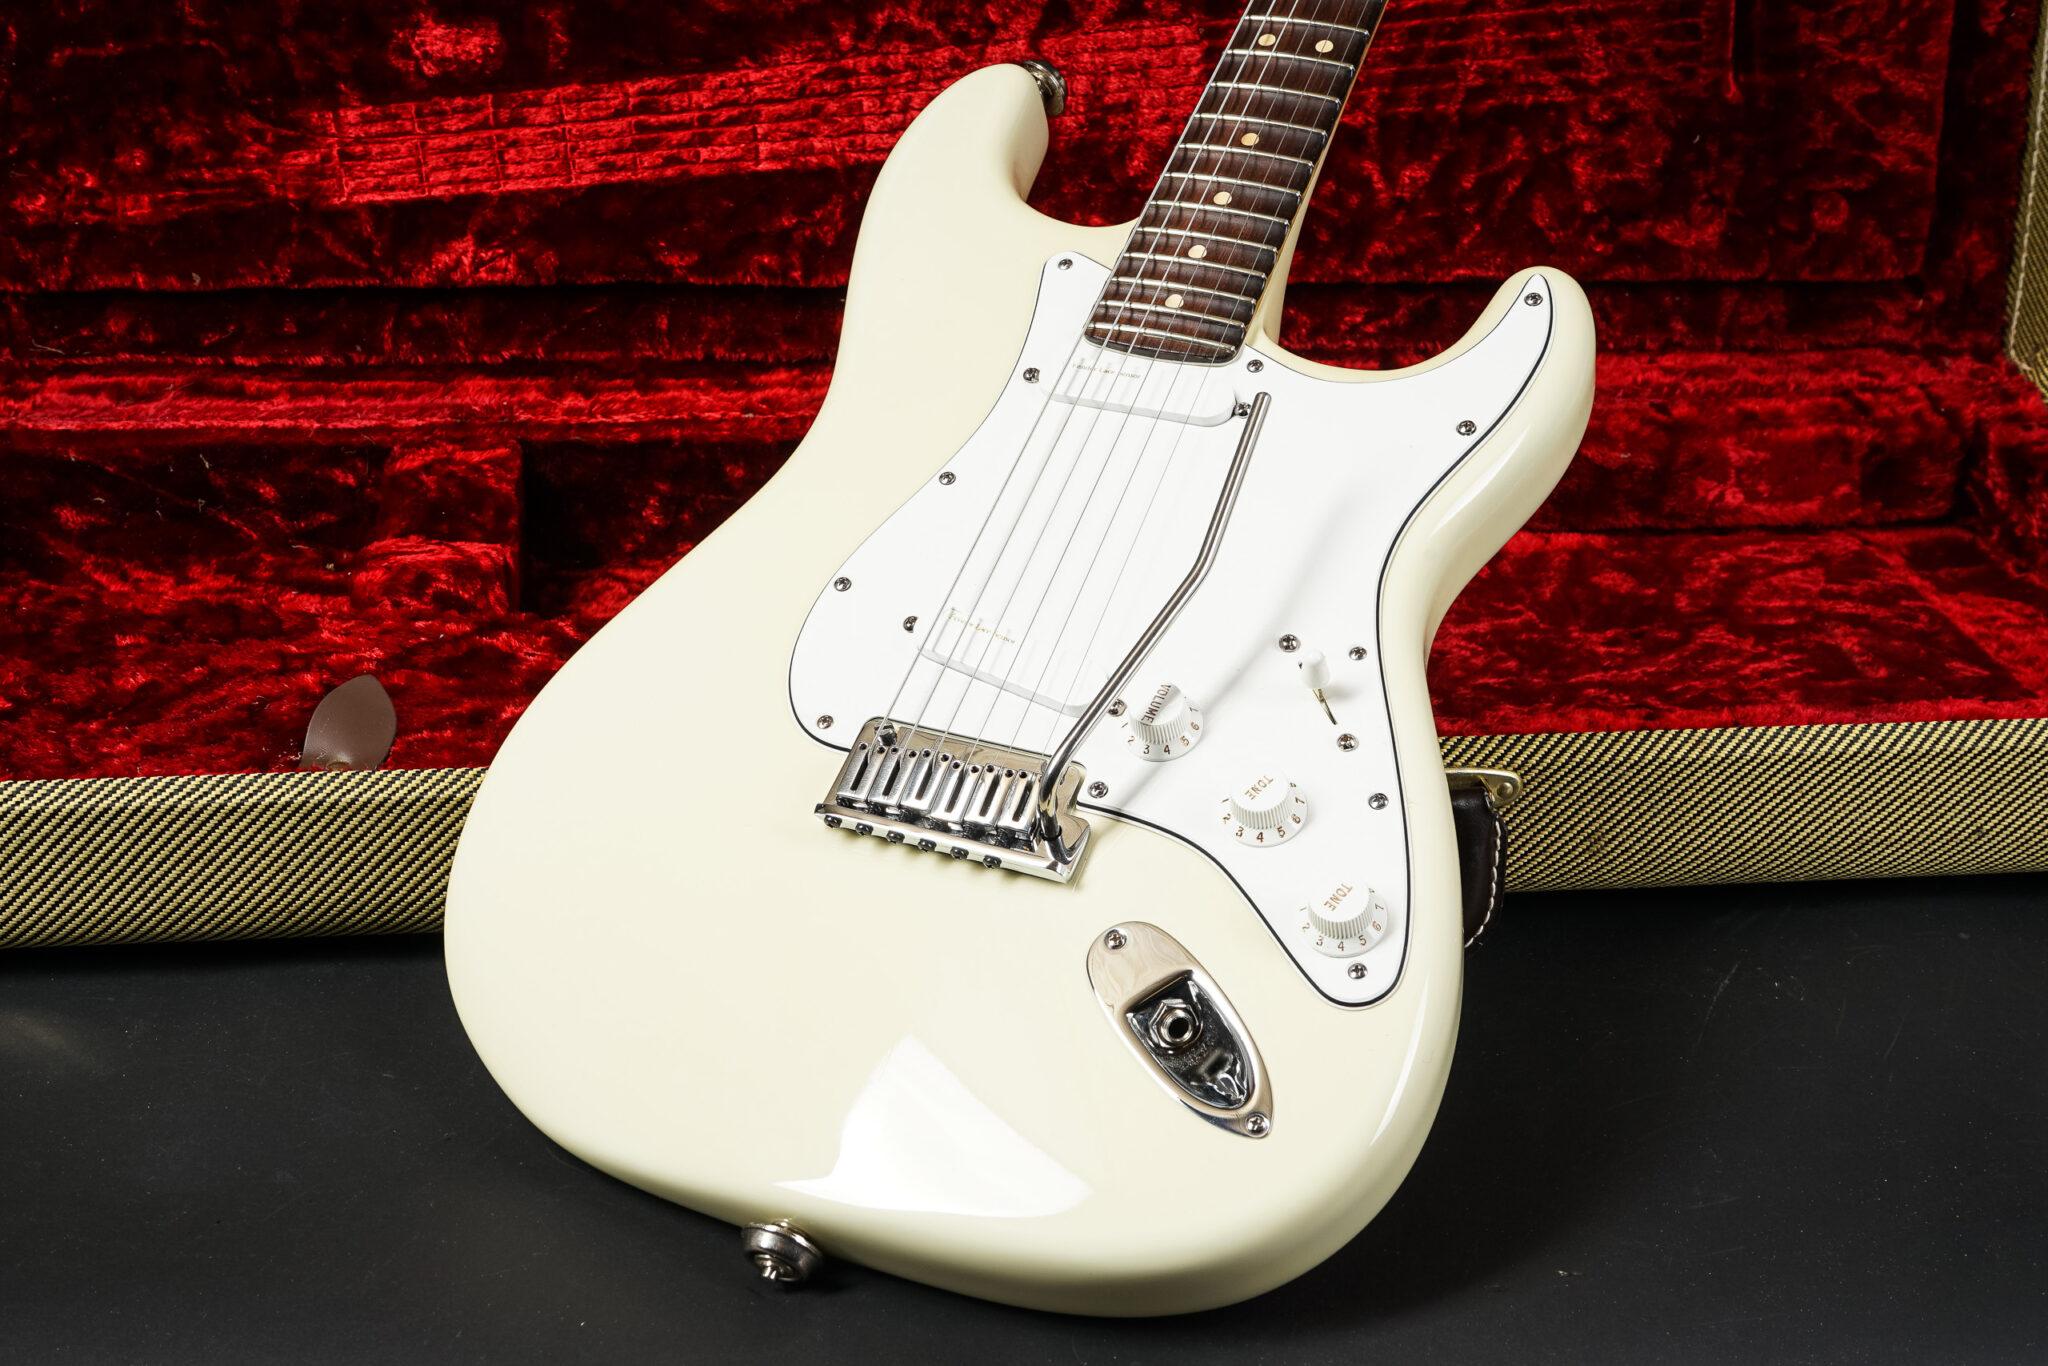 https://guitarpoint.de/app/uploads/products/2005-fender-custom-shop-ritchie-blackmore-set-neck-strat-olympic-white/2005-Fender-Ritchie-Blackmore-Strast-Custom-Shop-SZ053405-15-2048x1366.jpg